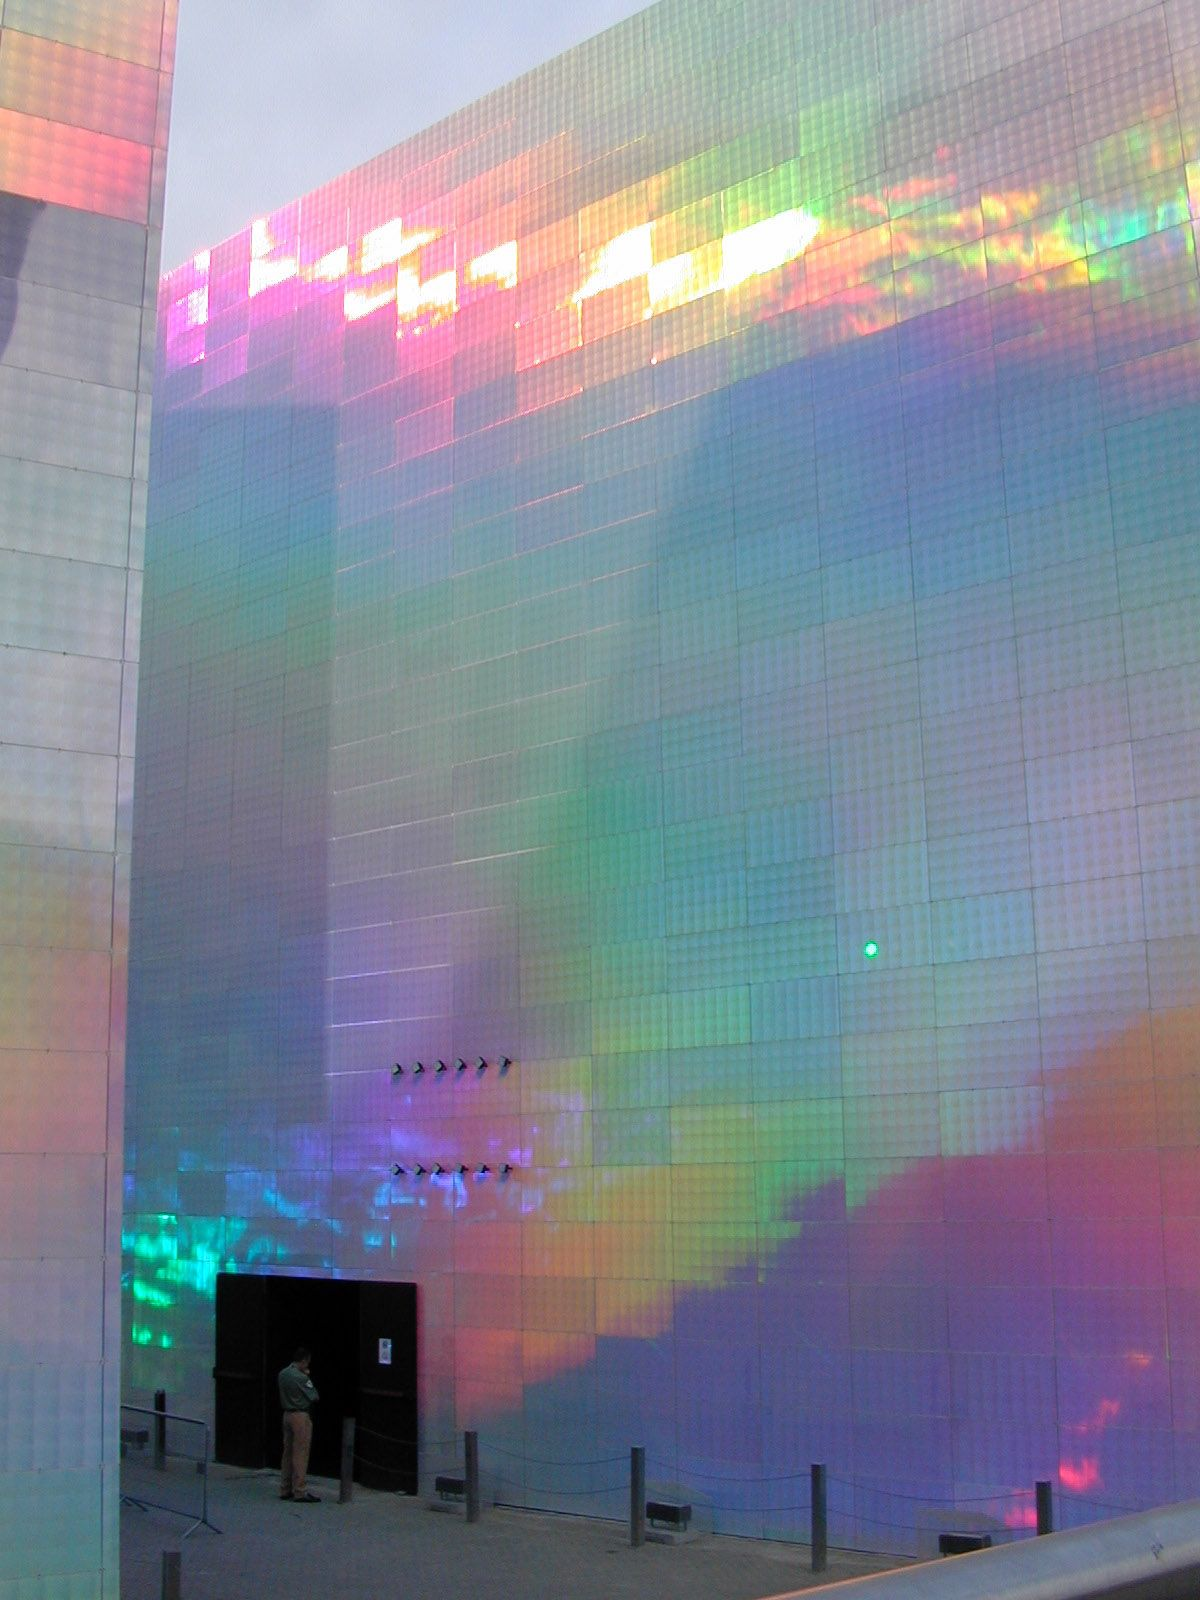 Guggenheim Bilbao Quantum FieldX holographic exhibit